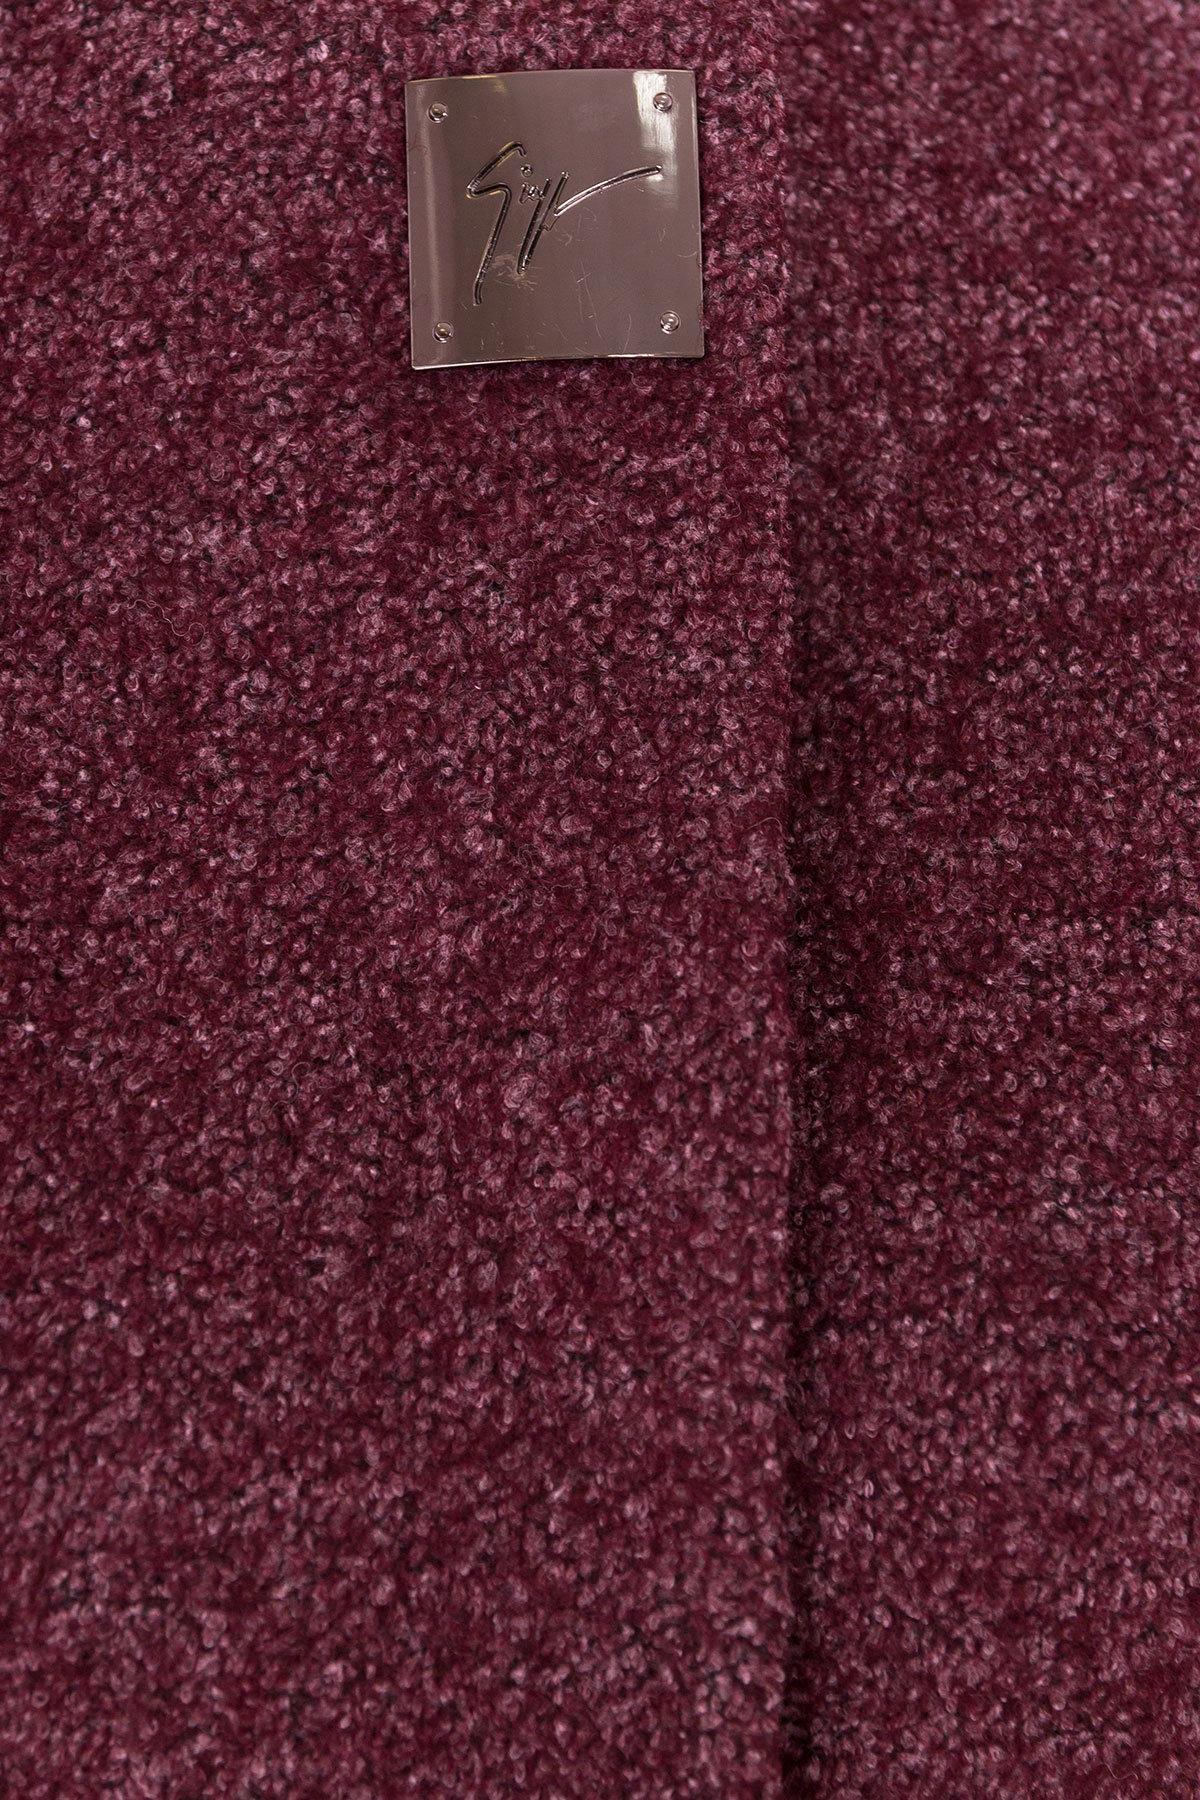 Пальто на весну Дакс 1679 АРТ. 16668 Цвет: Марсала - фото 5, интернет магазин tm-modus.ru